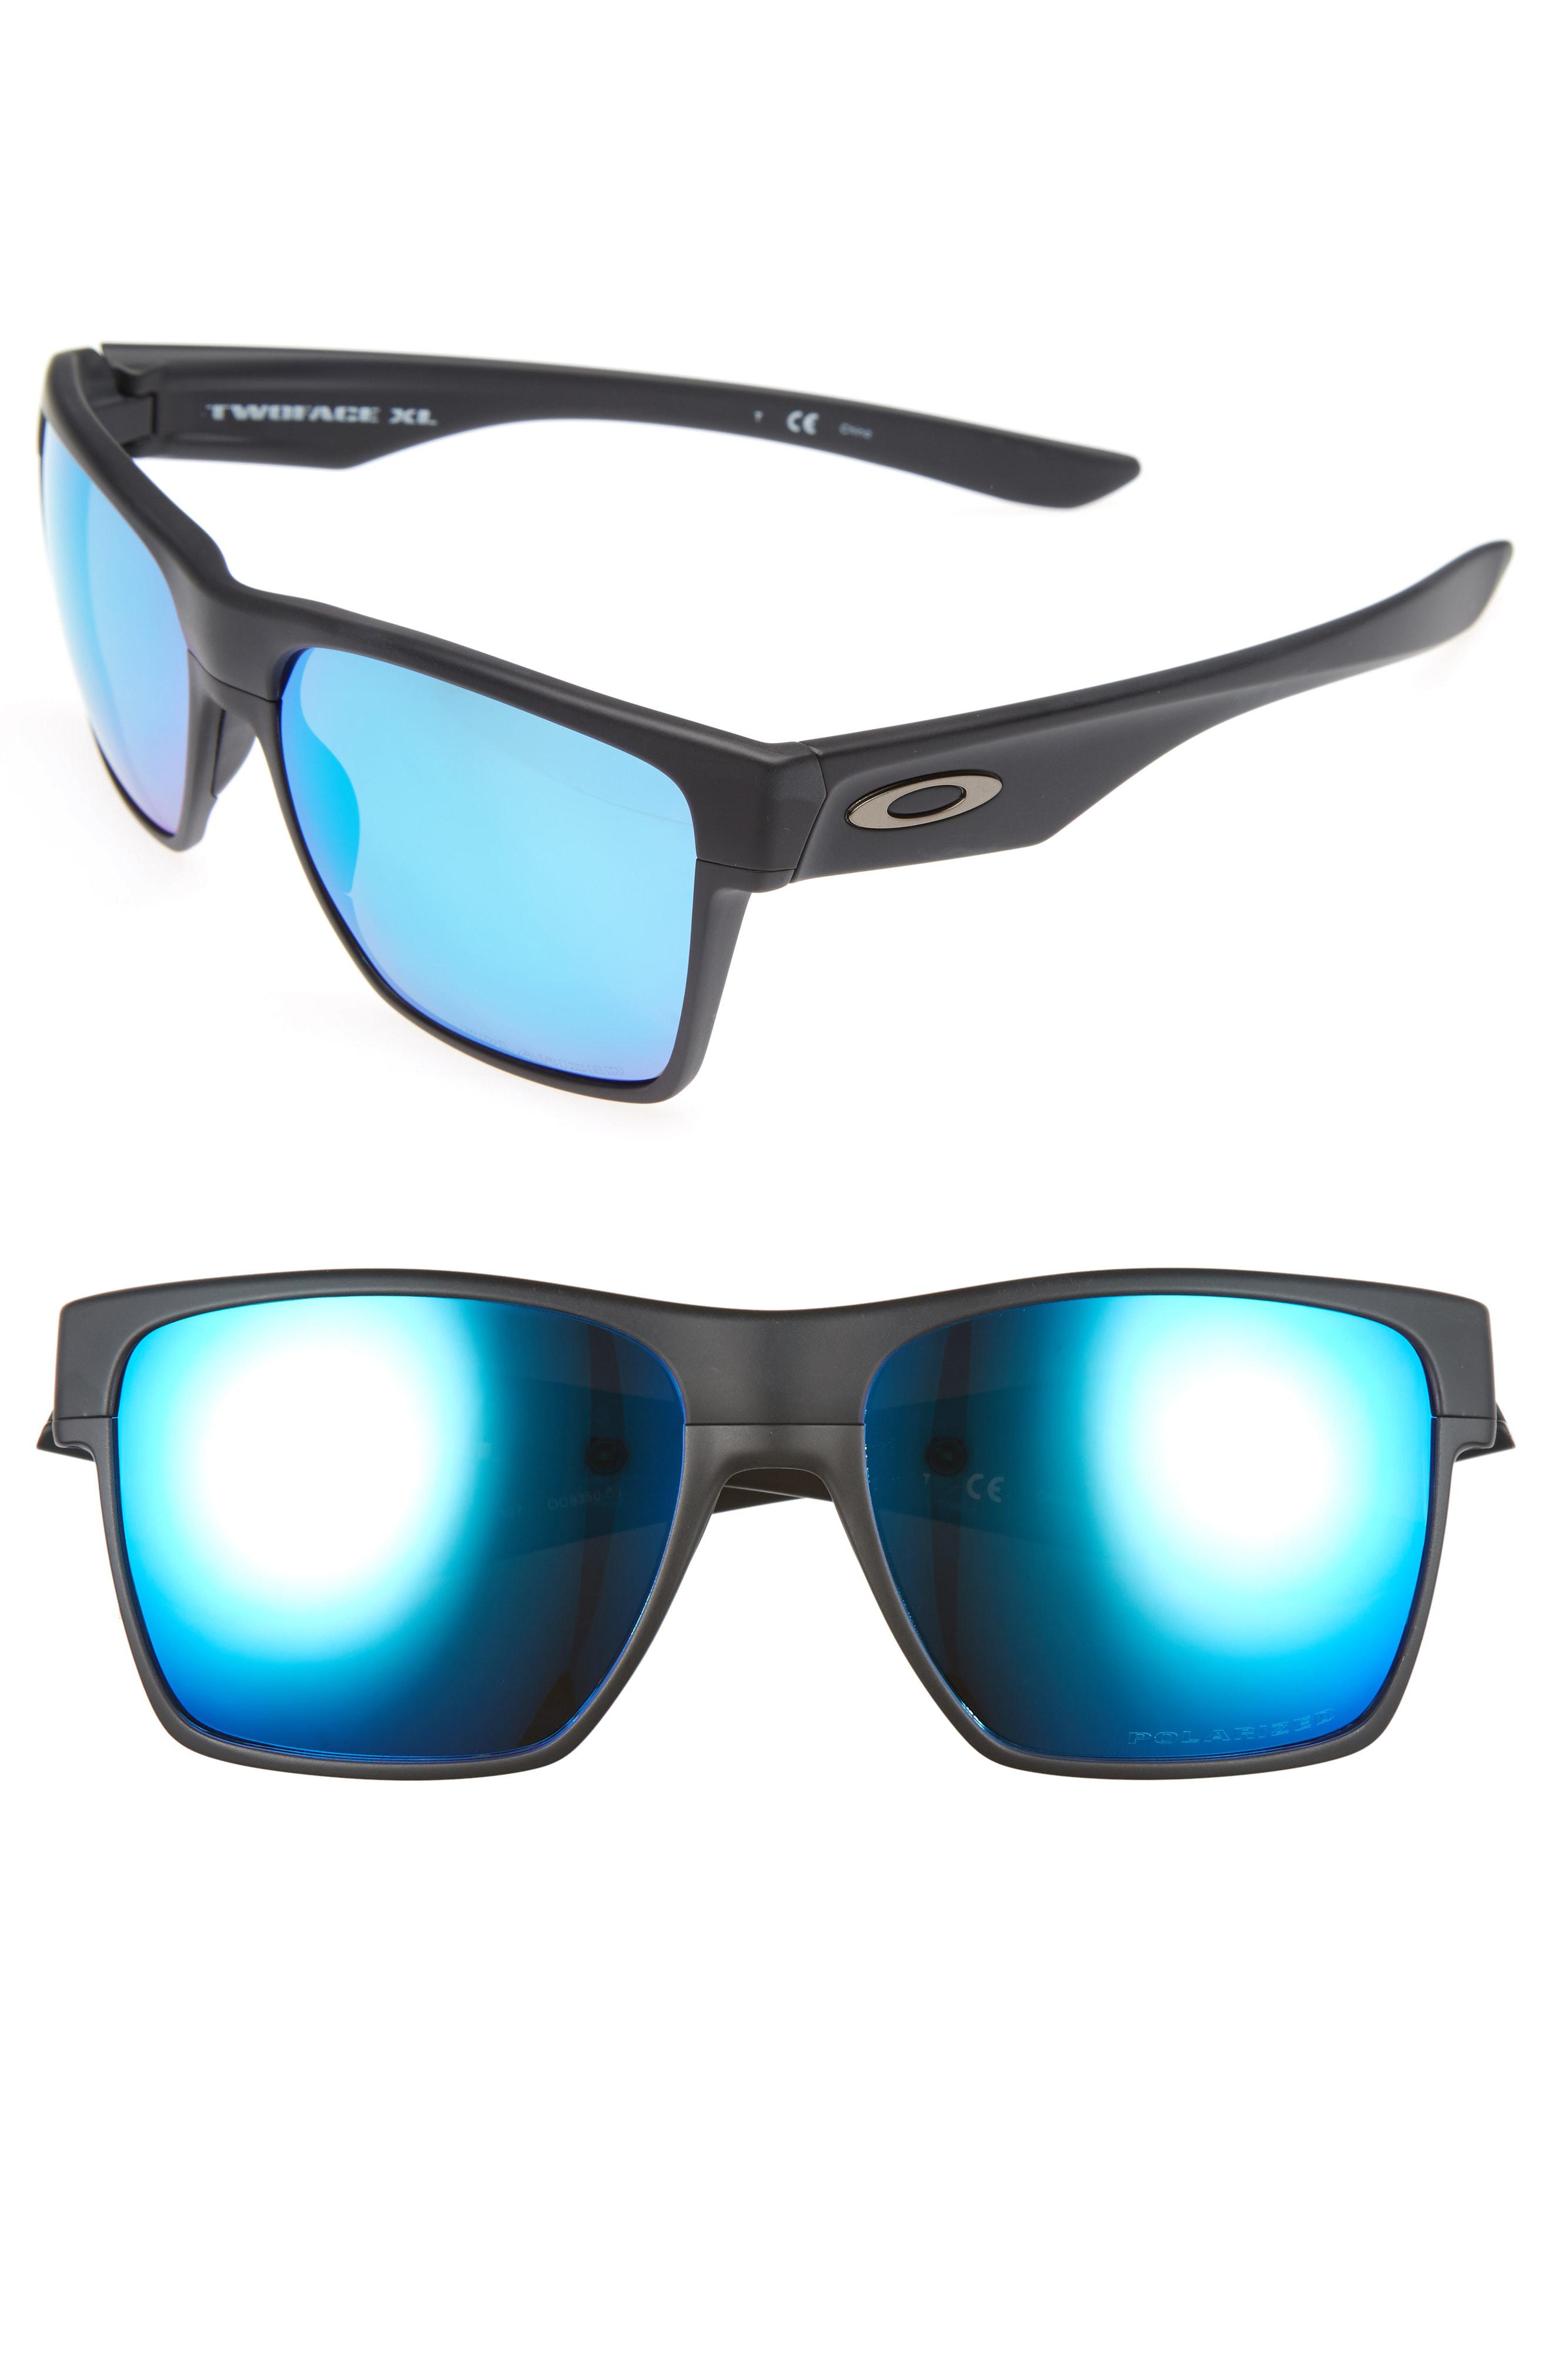 75629daa1f ... new zealand oakley. mens black twoface xl 59mm polarized sunglasses  e3274 0d42b